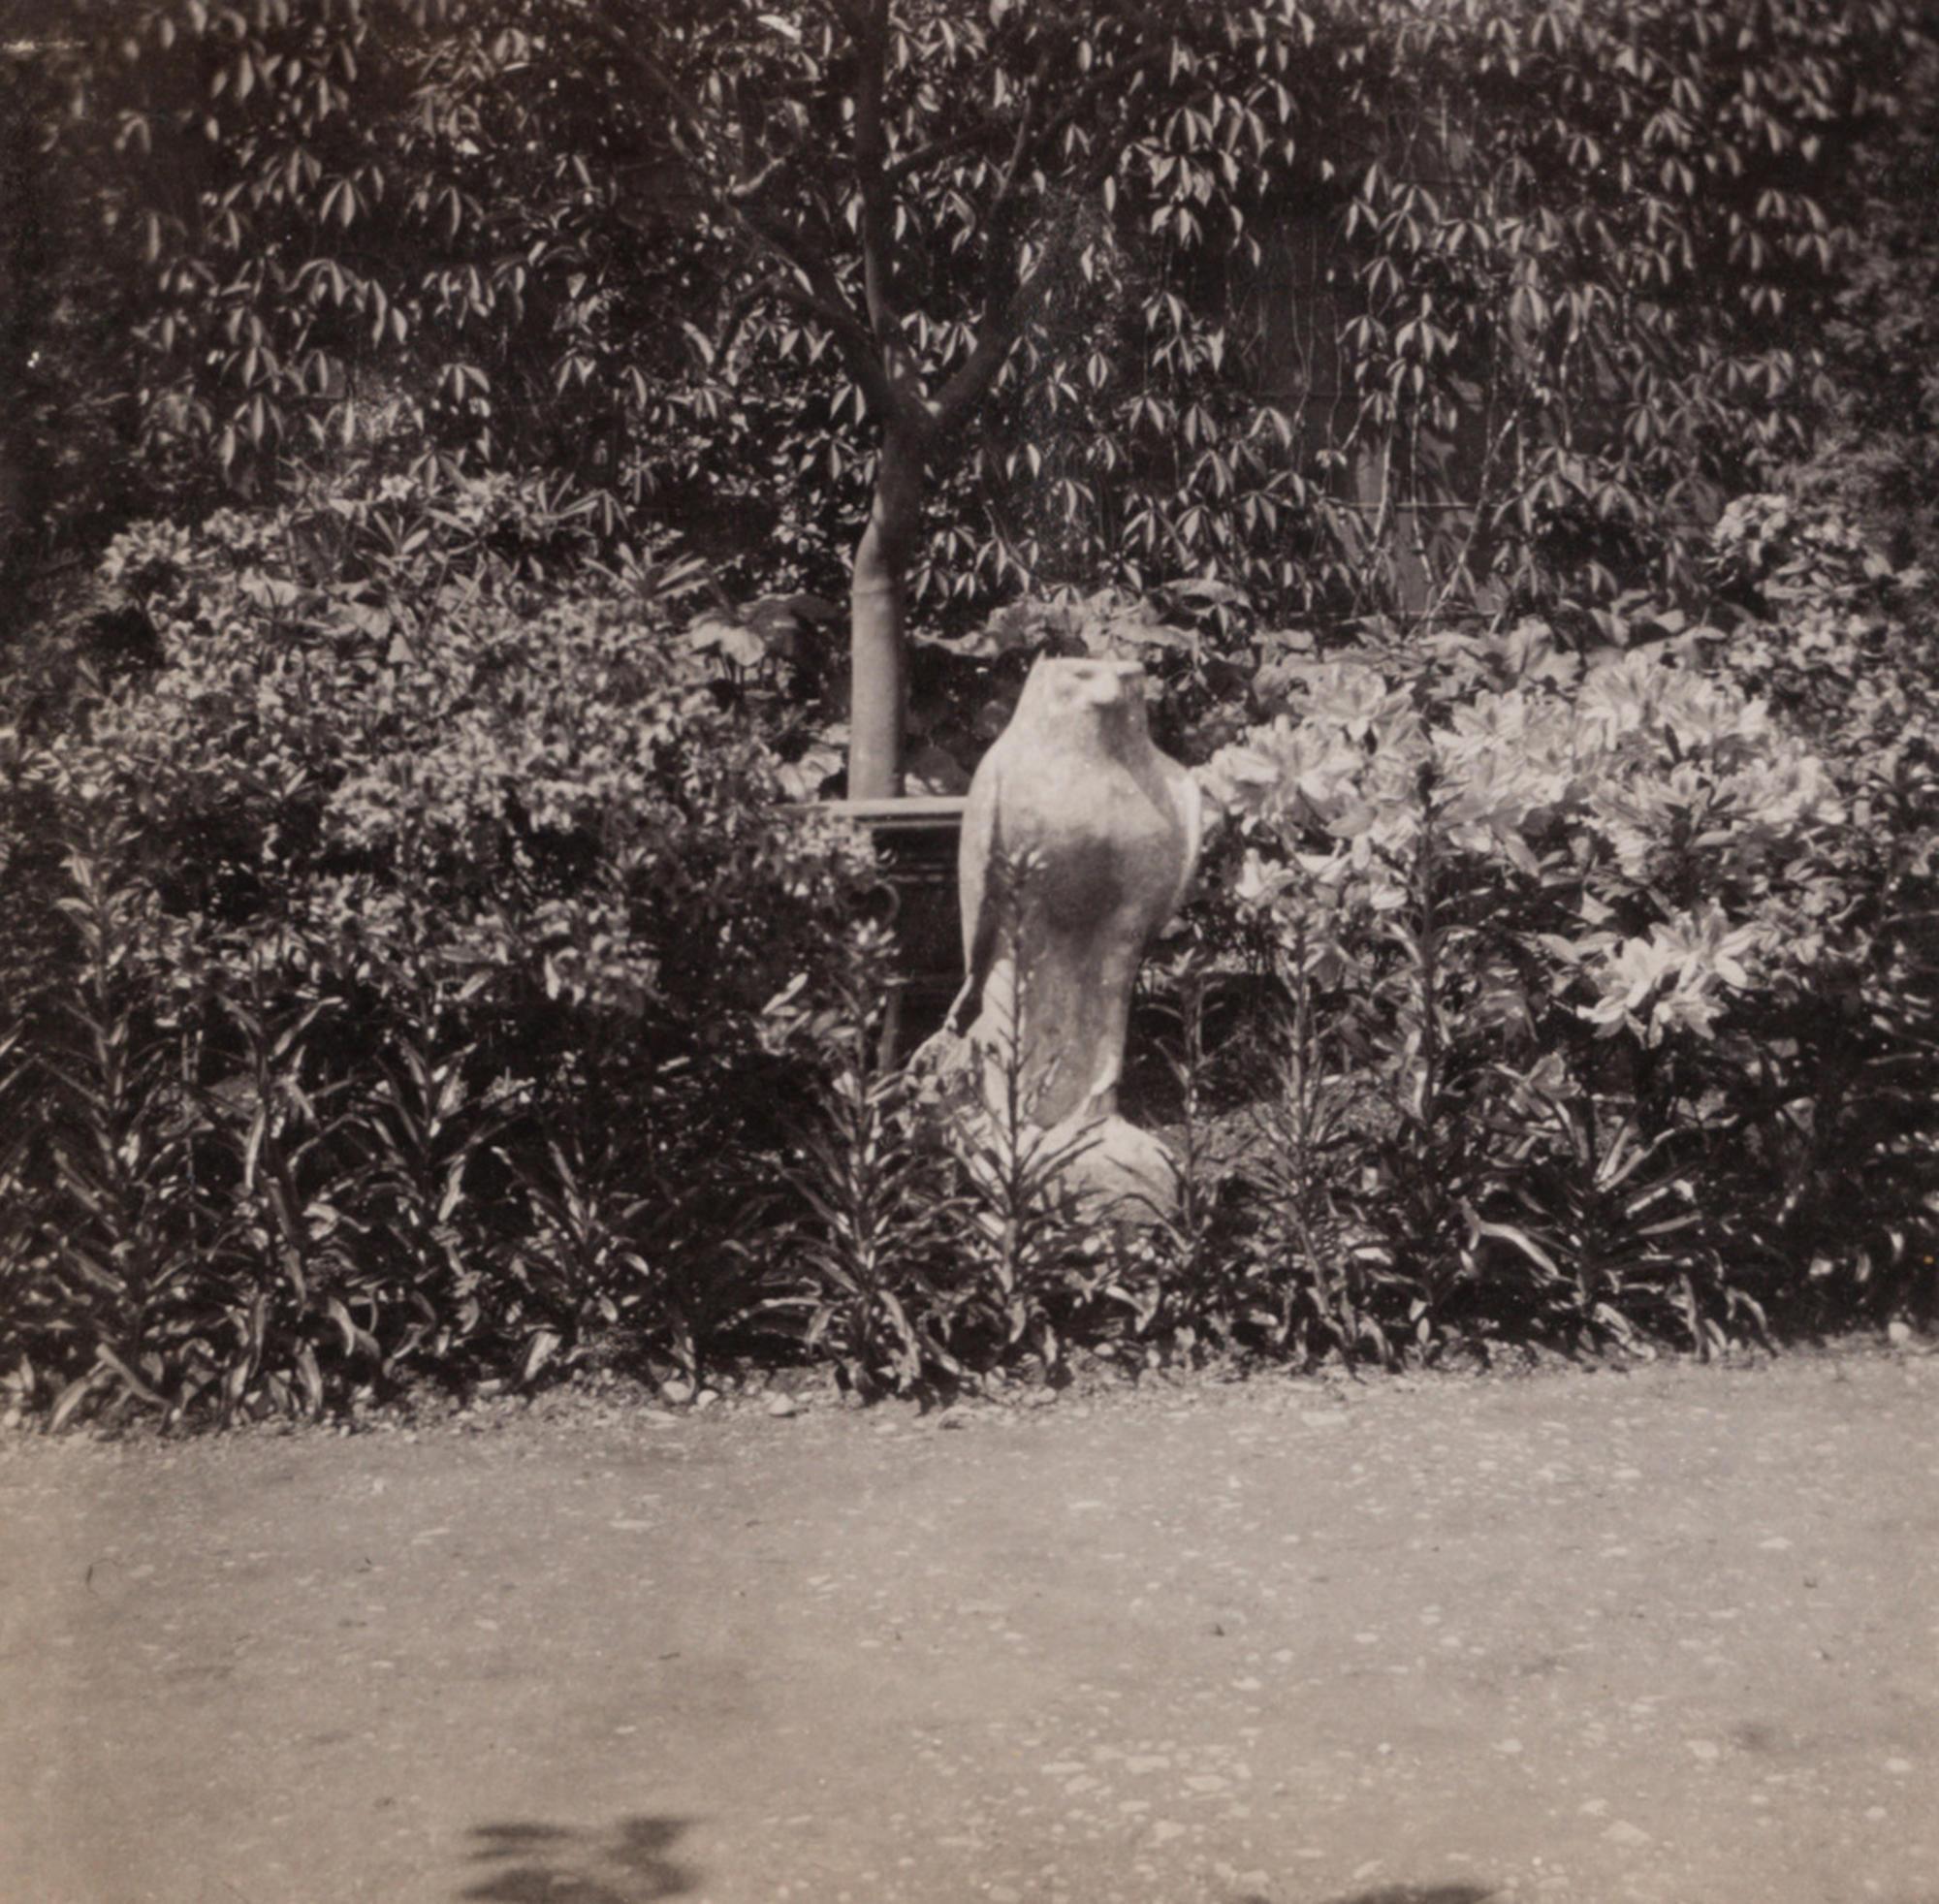 The 4th century BC, Egyptian sculpture, Horus, in the Italian Garden at Green Hill, 1898